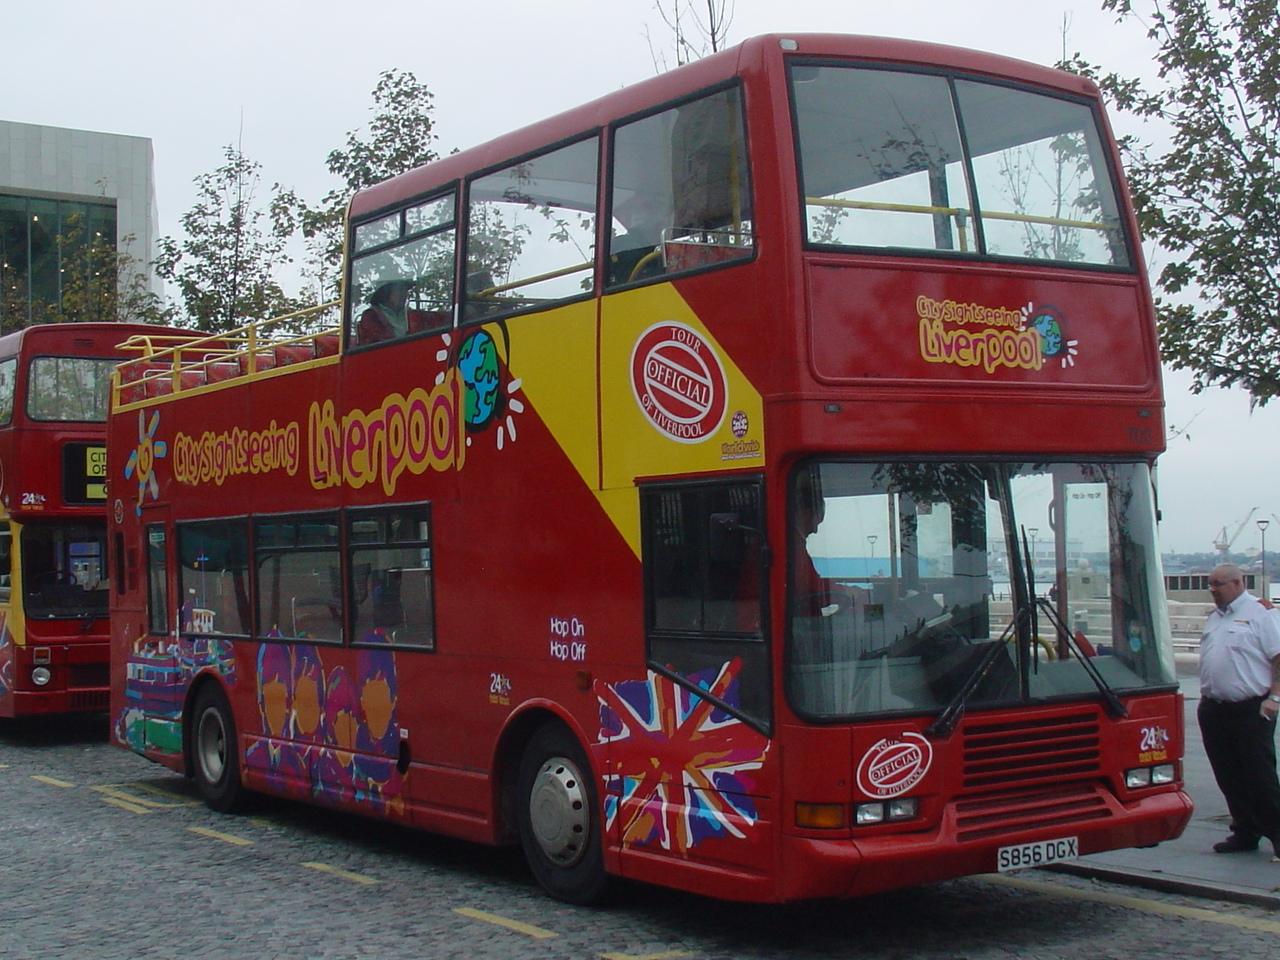 Liverpool Tour